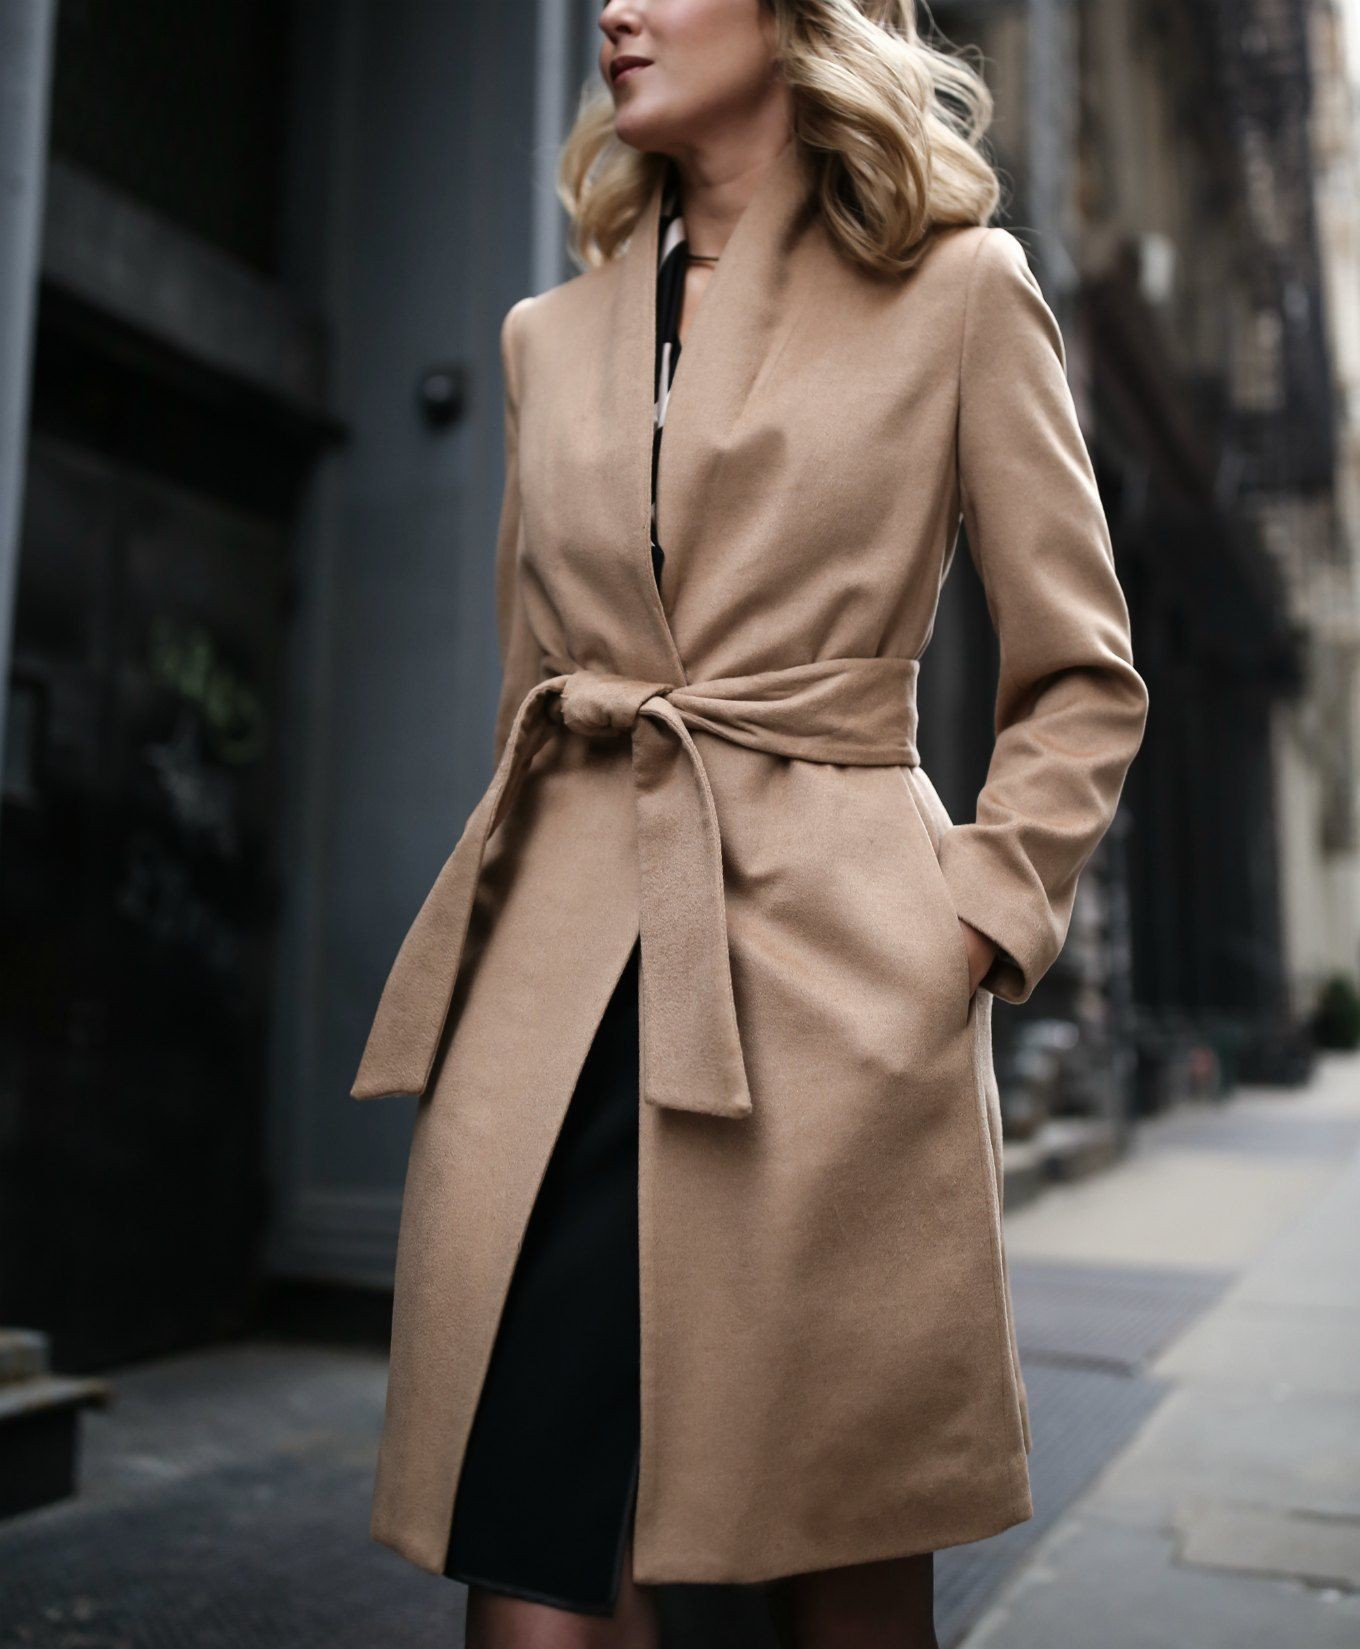 Sheath dress with long coat